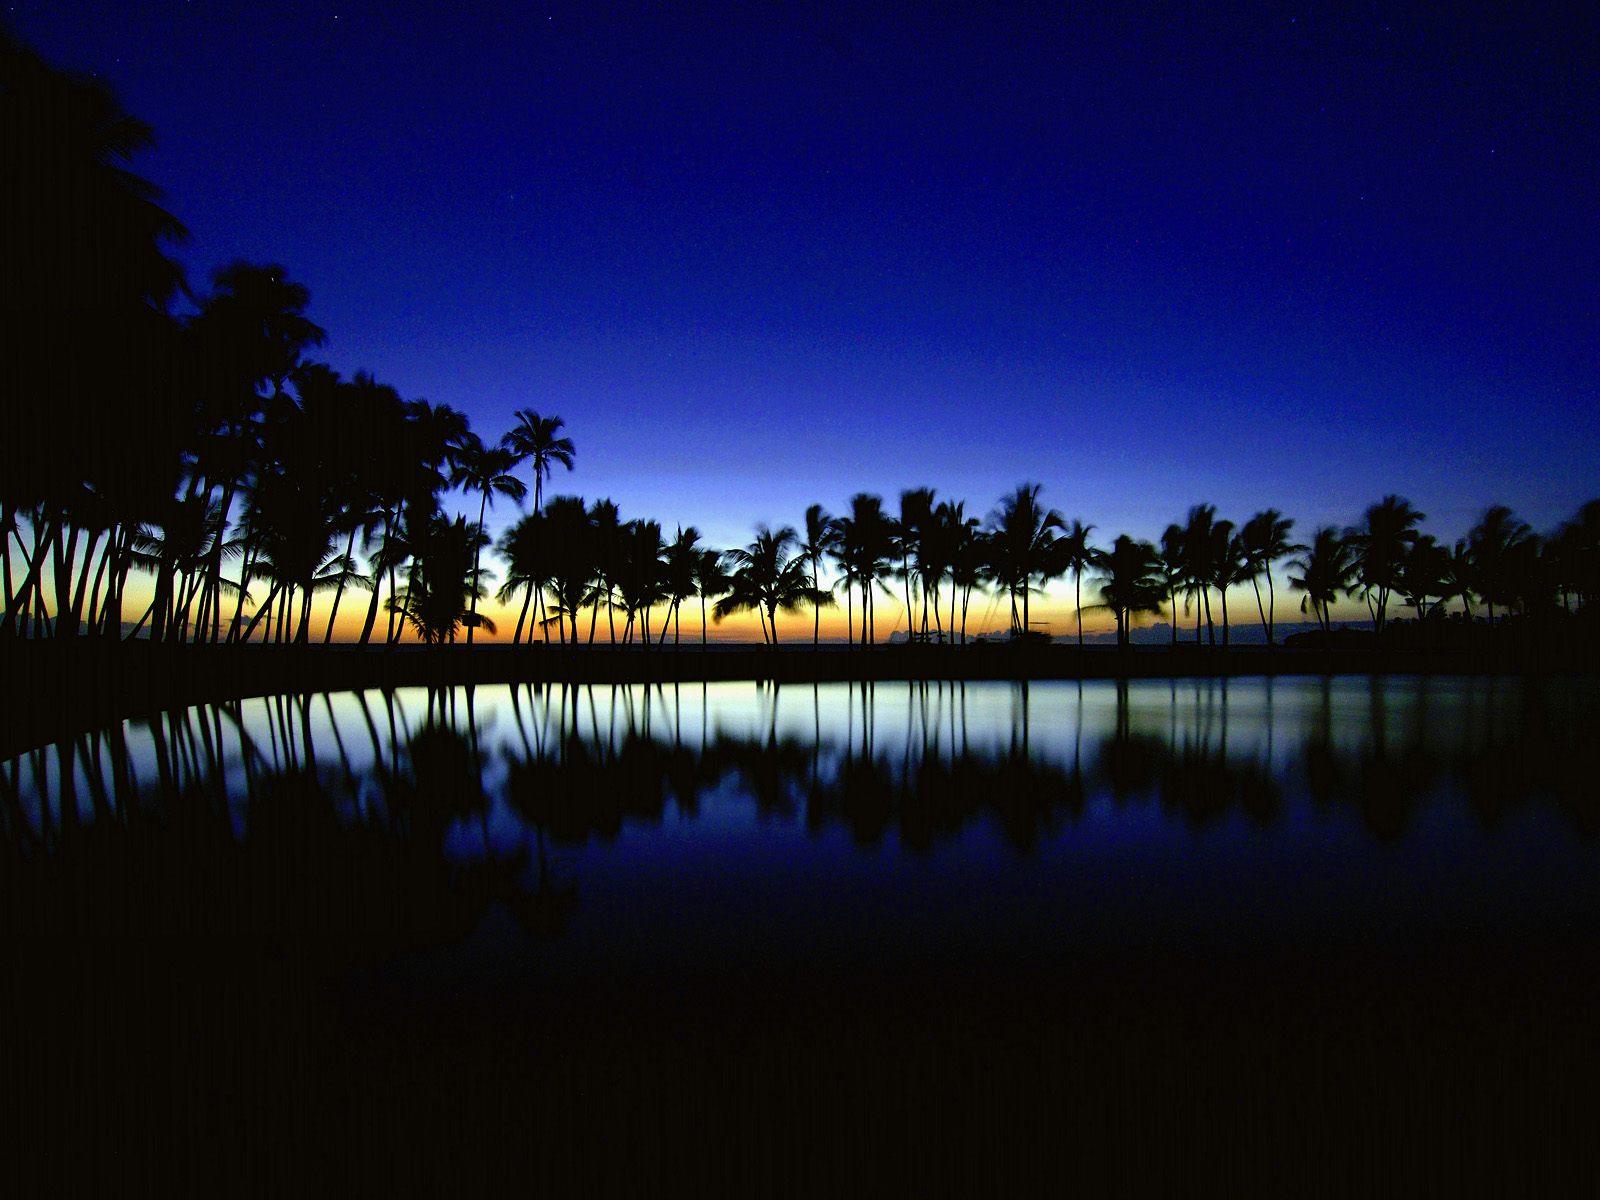 Palm Silhouette Big Island Hawaii Wallpapers HD Wallpapers 1600x1200